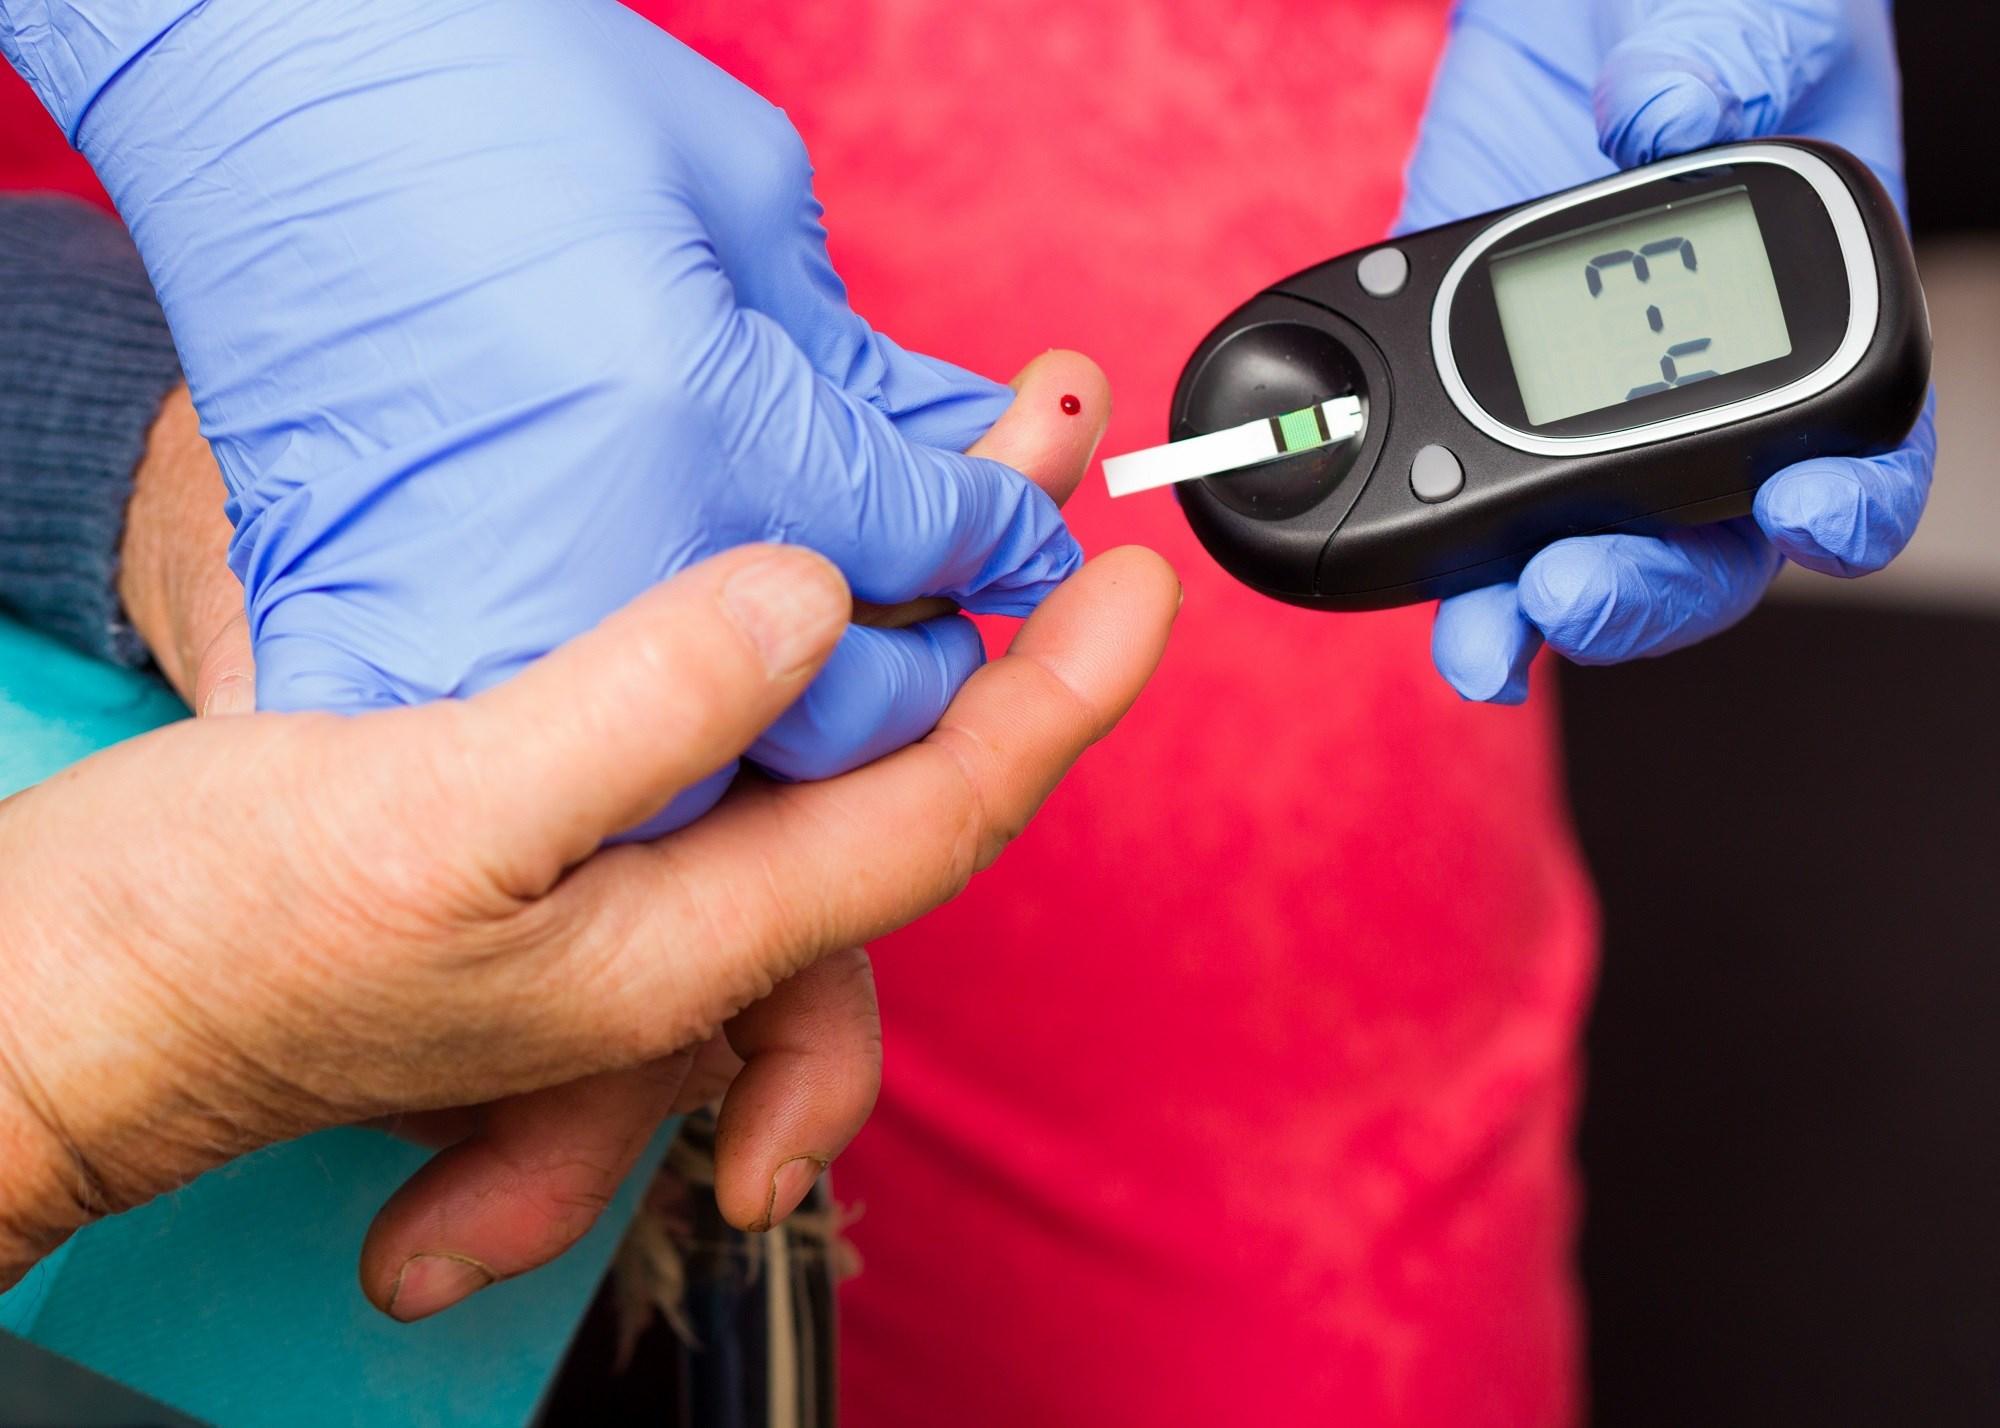 Diabetes Screening Rates Suboptimal Among Patients With Rheumatoid Arthritis